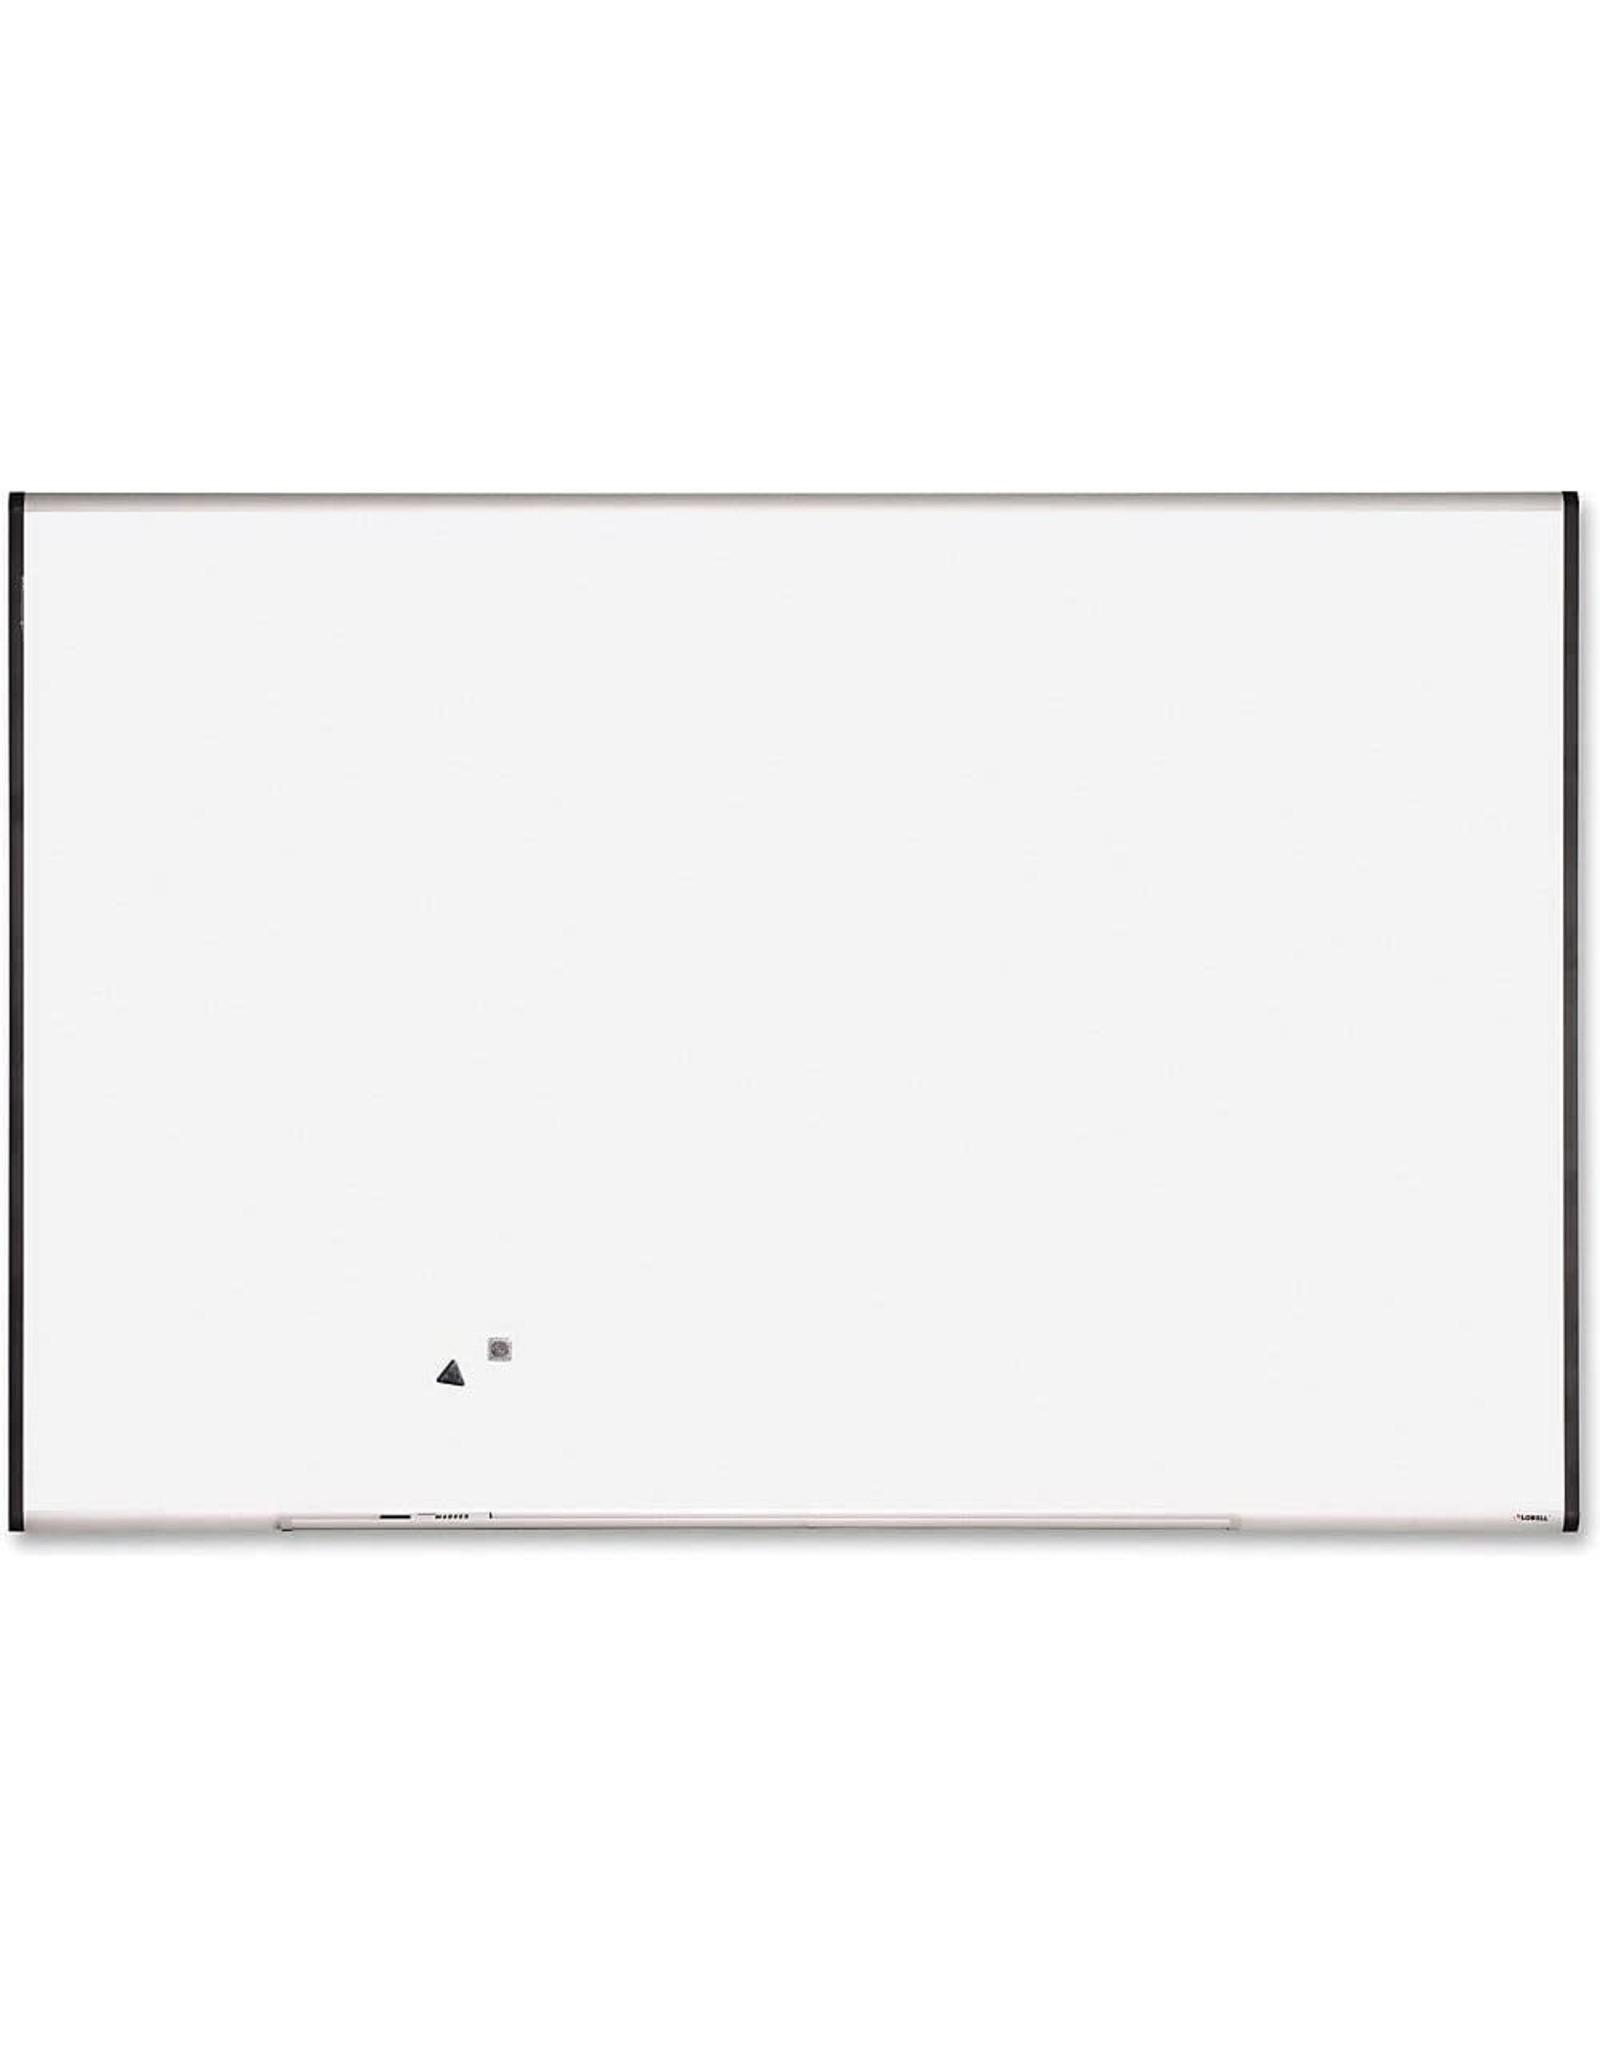 Lorell Lorell Magnetic Dry-Erase Board, 6-Feet by 4-Feet, Silver/Ebony